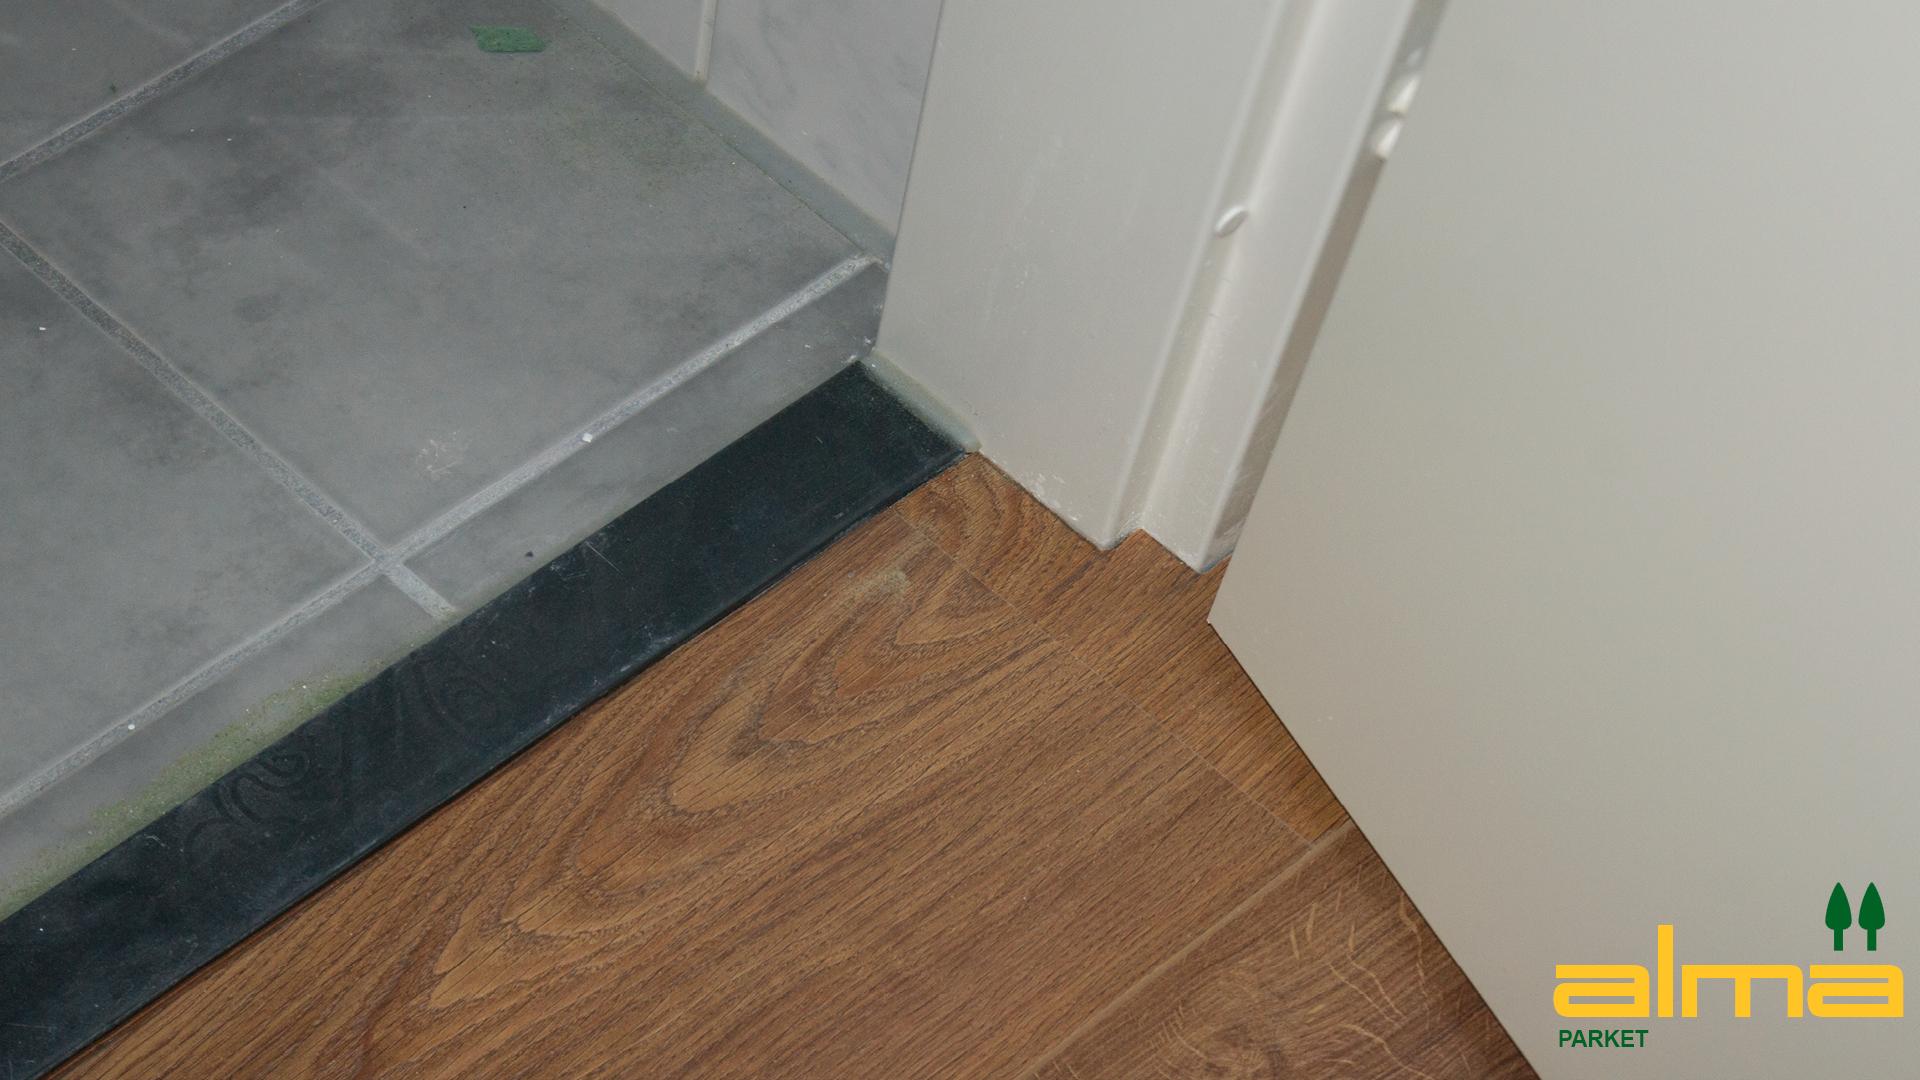 760 detail strak modern aansluiting muur wand vloer parket hout laminaat tegel details tegels - Parket aan de muur ...